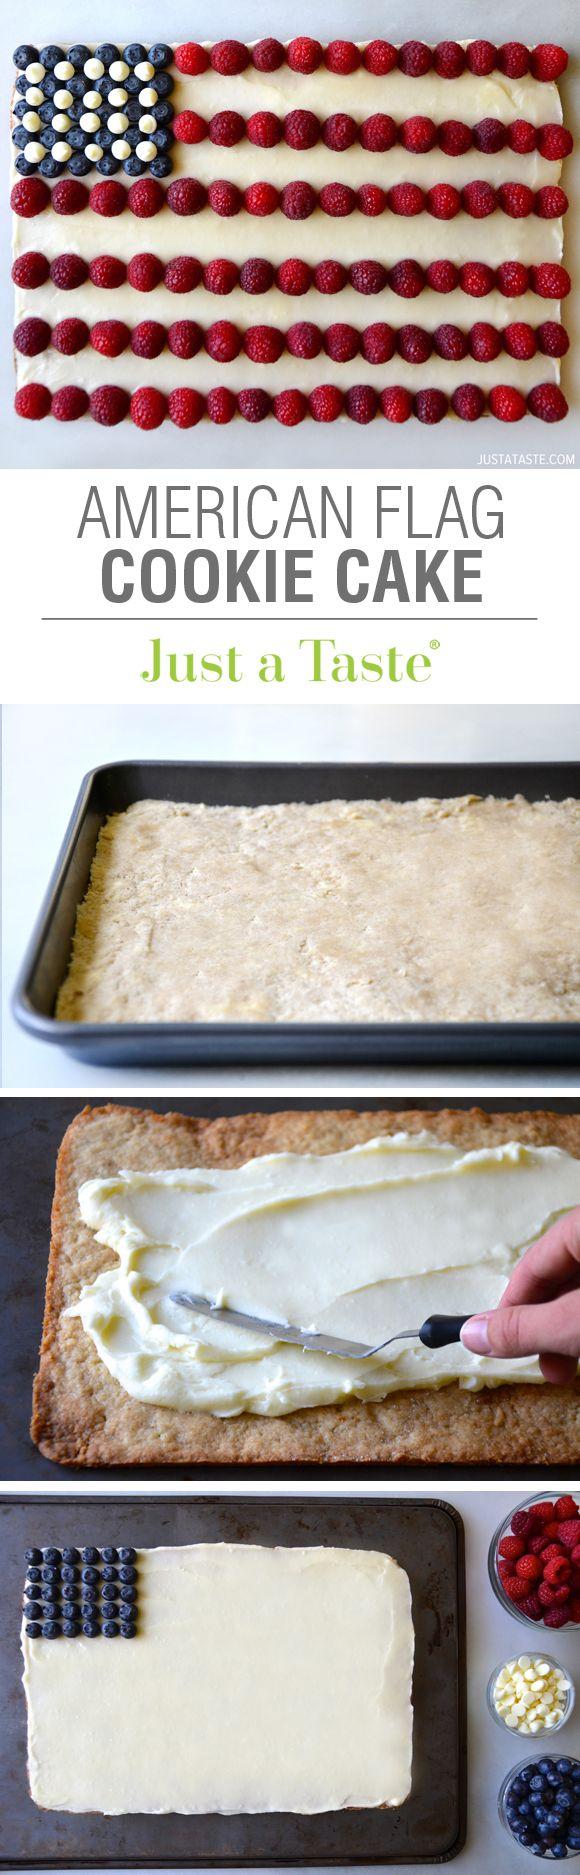 American Flag Cookie Cake #recipe from justataste.com